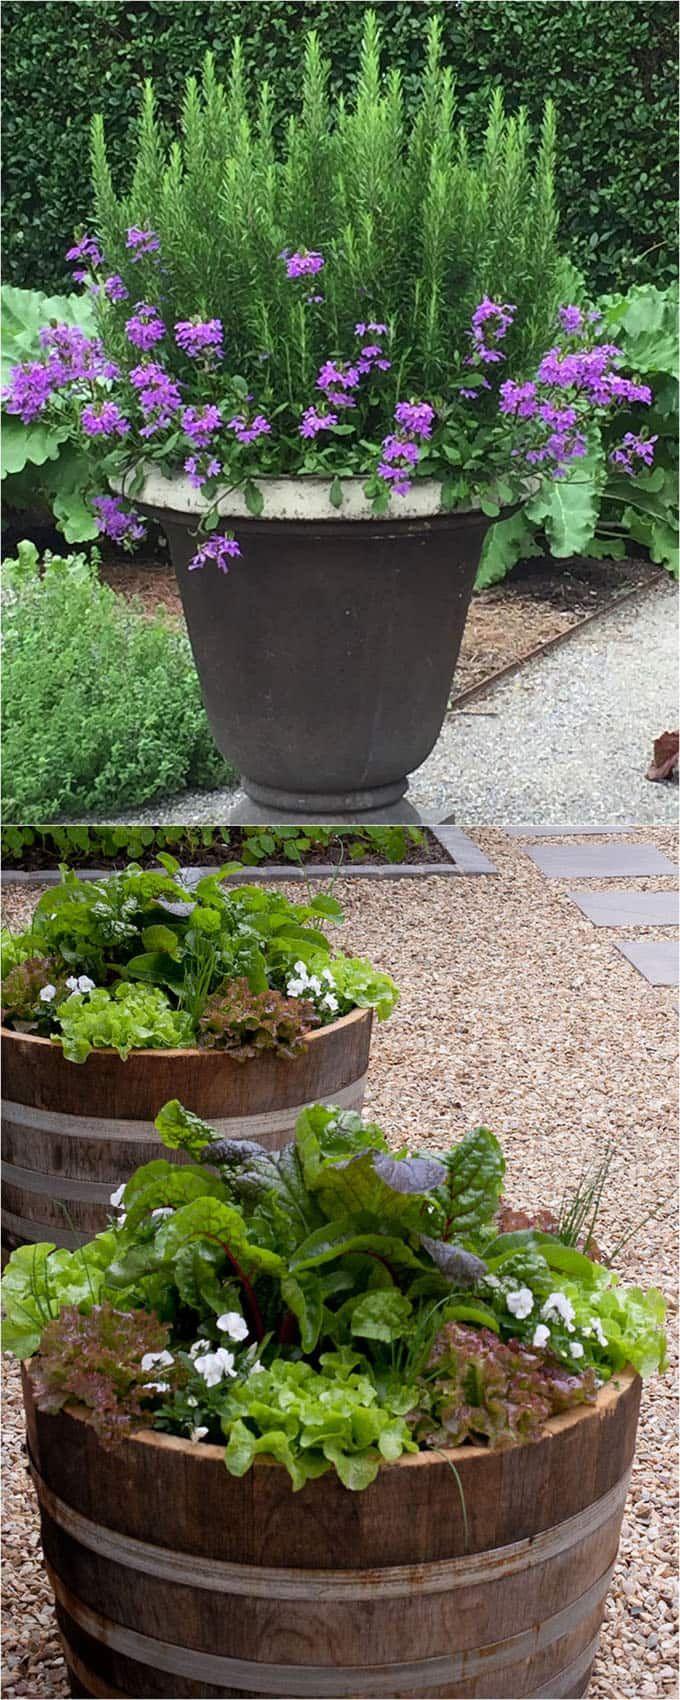 24 Stunning Container Garden Planting Ideas Plants 400 x 300